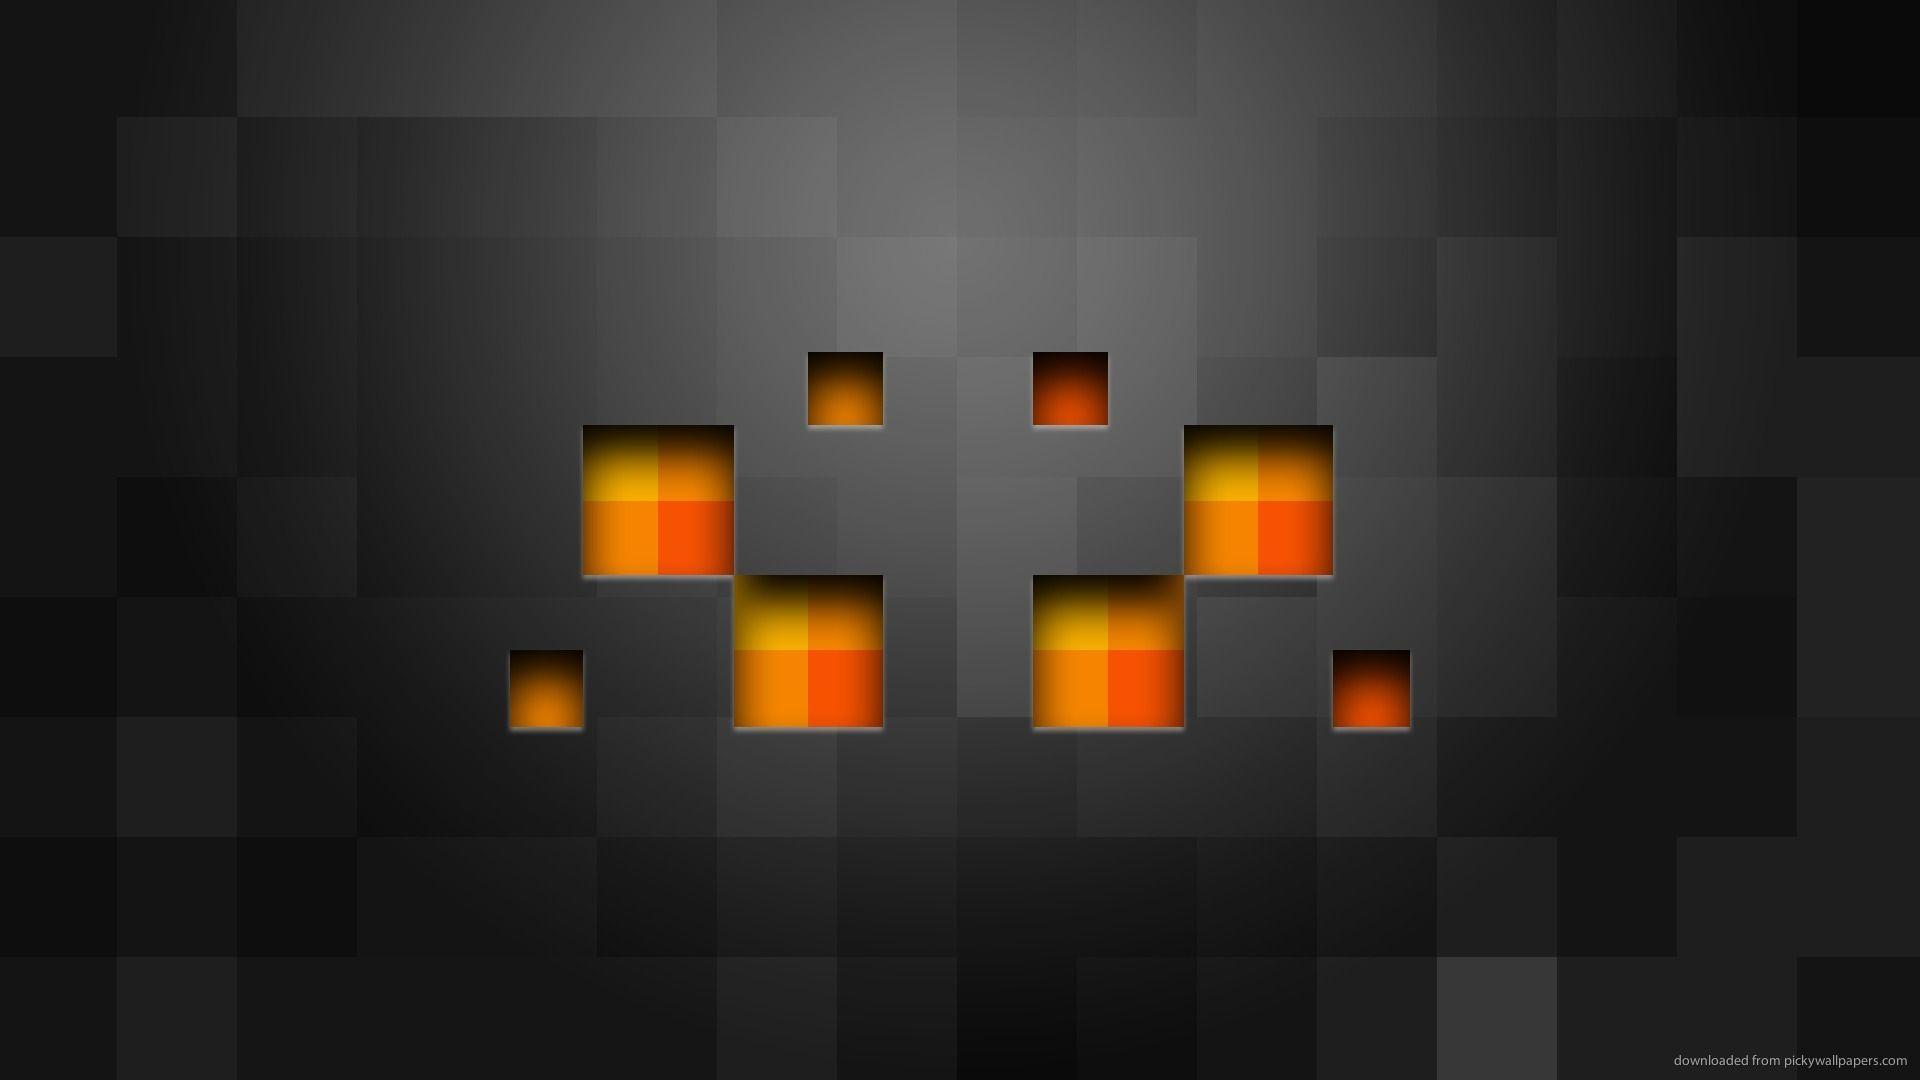 Minecraft Wallpaper Hd Free Download